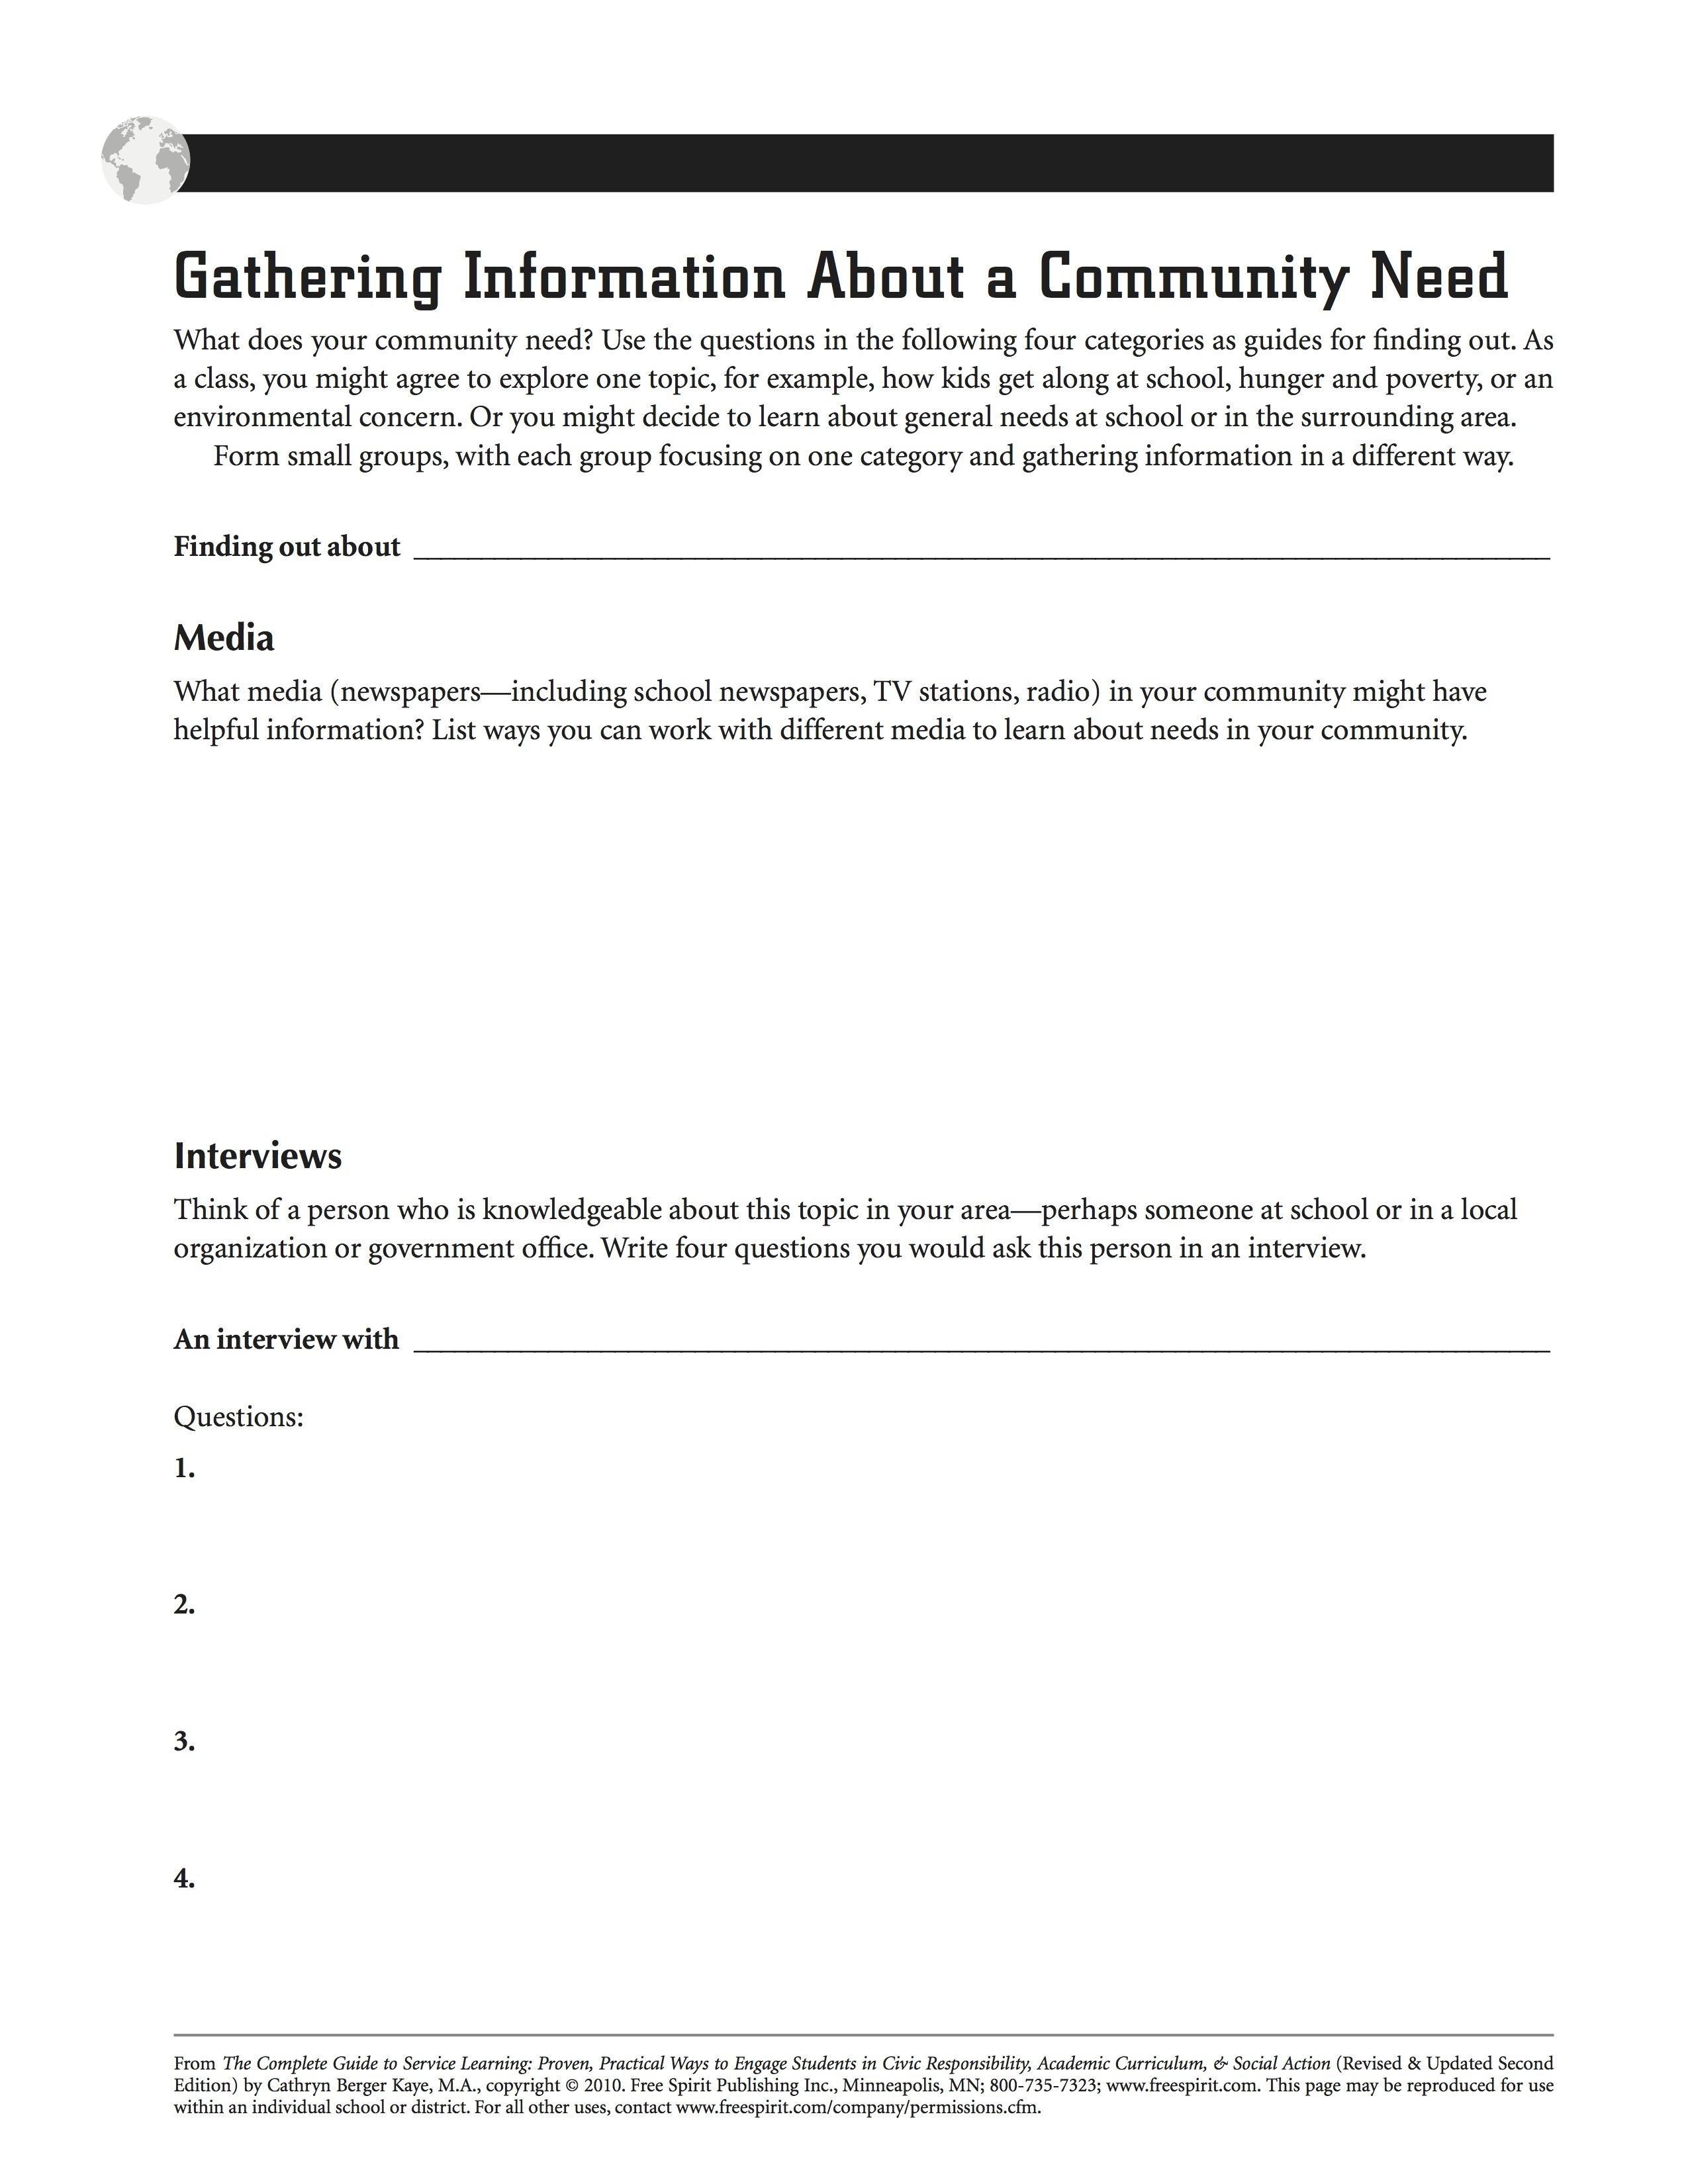 Free Printable Service Learning Worksheet: Gathering Information - Free Printable Customer Service Worksheets